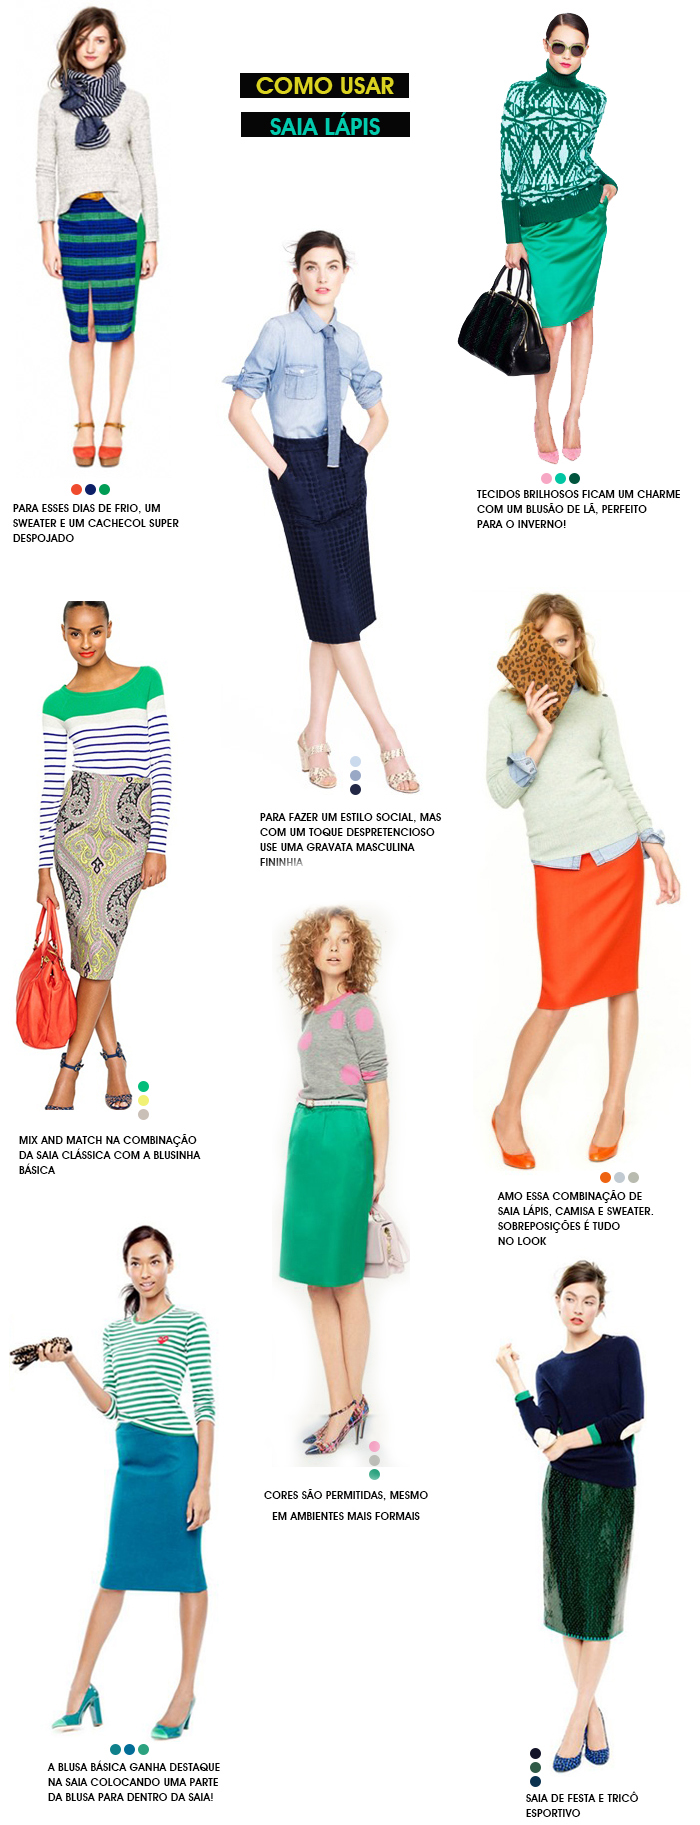 como-usar-saia-lápis-dica-de-estilo-j-crew-fashion-blog-MeninaIT